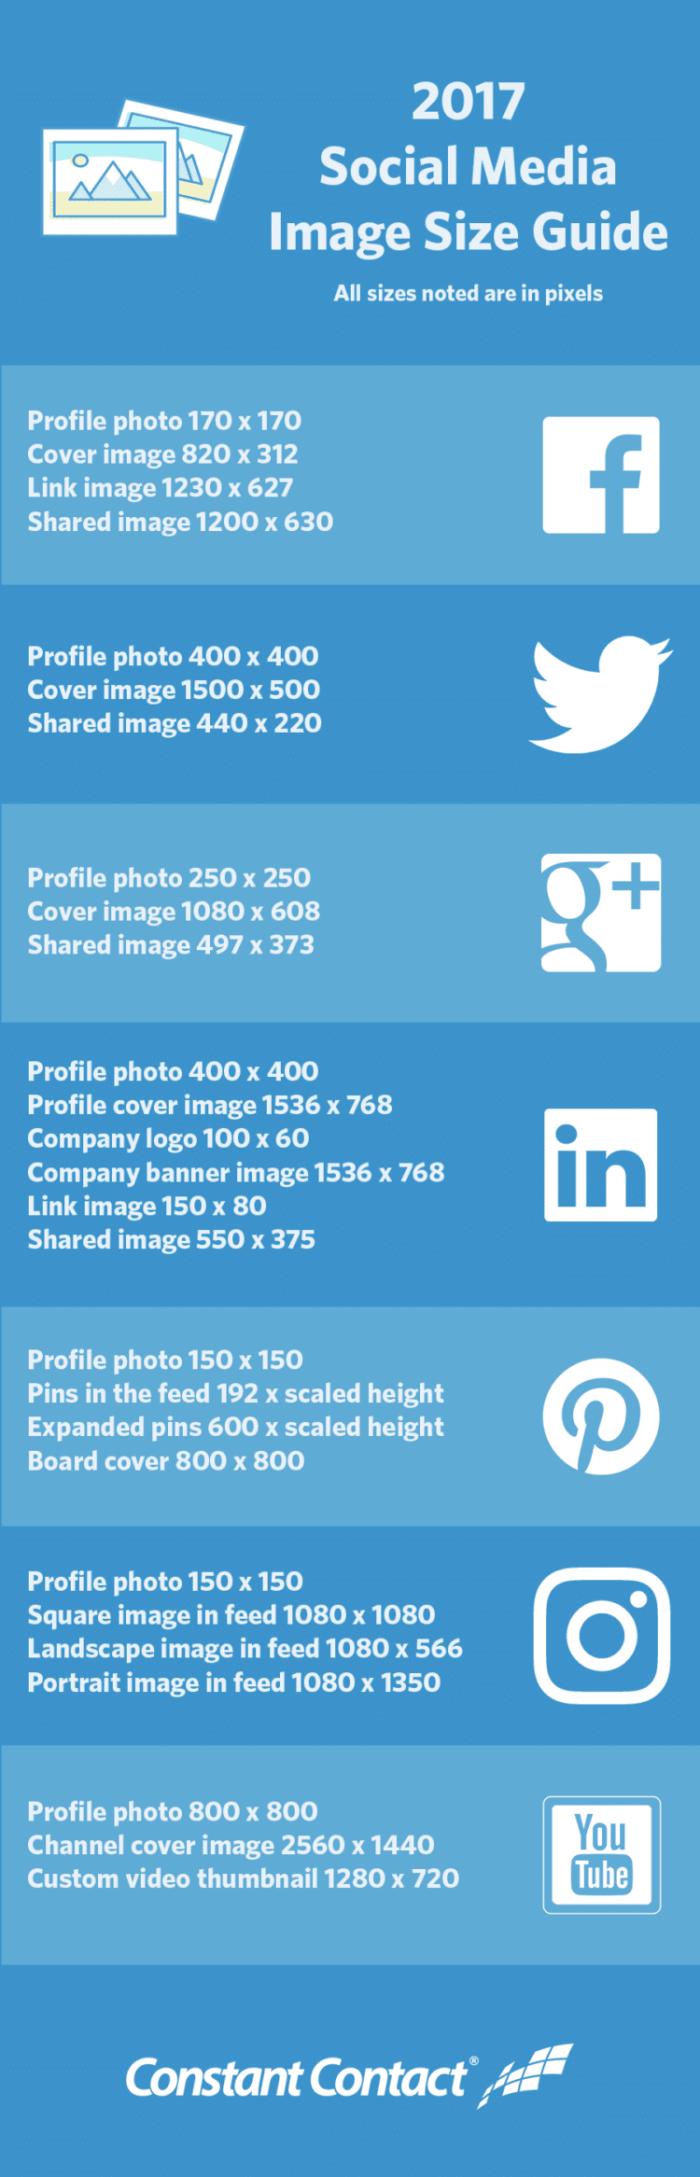 Social Media Image Sizes Guide 2017